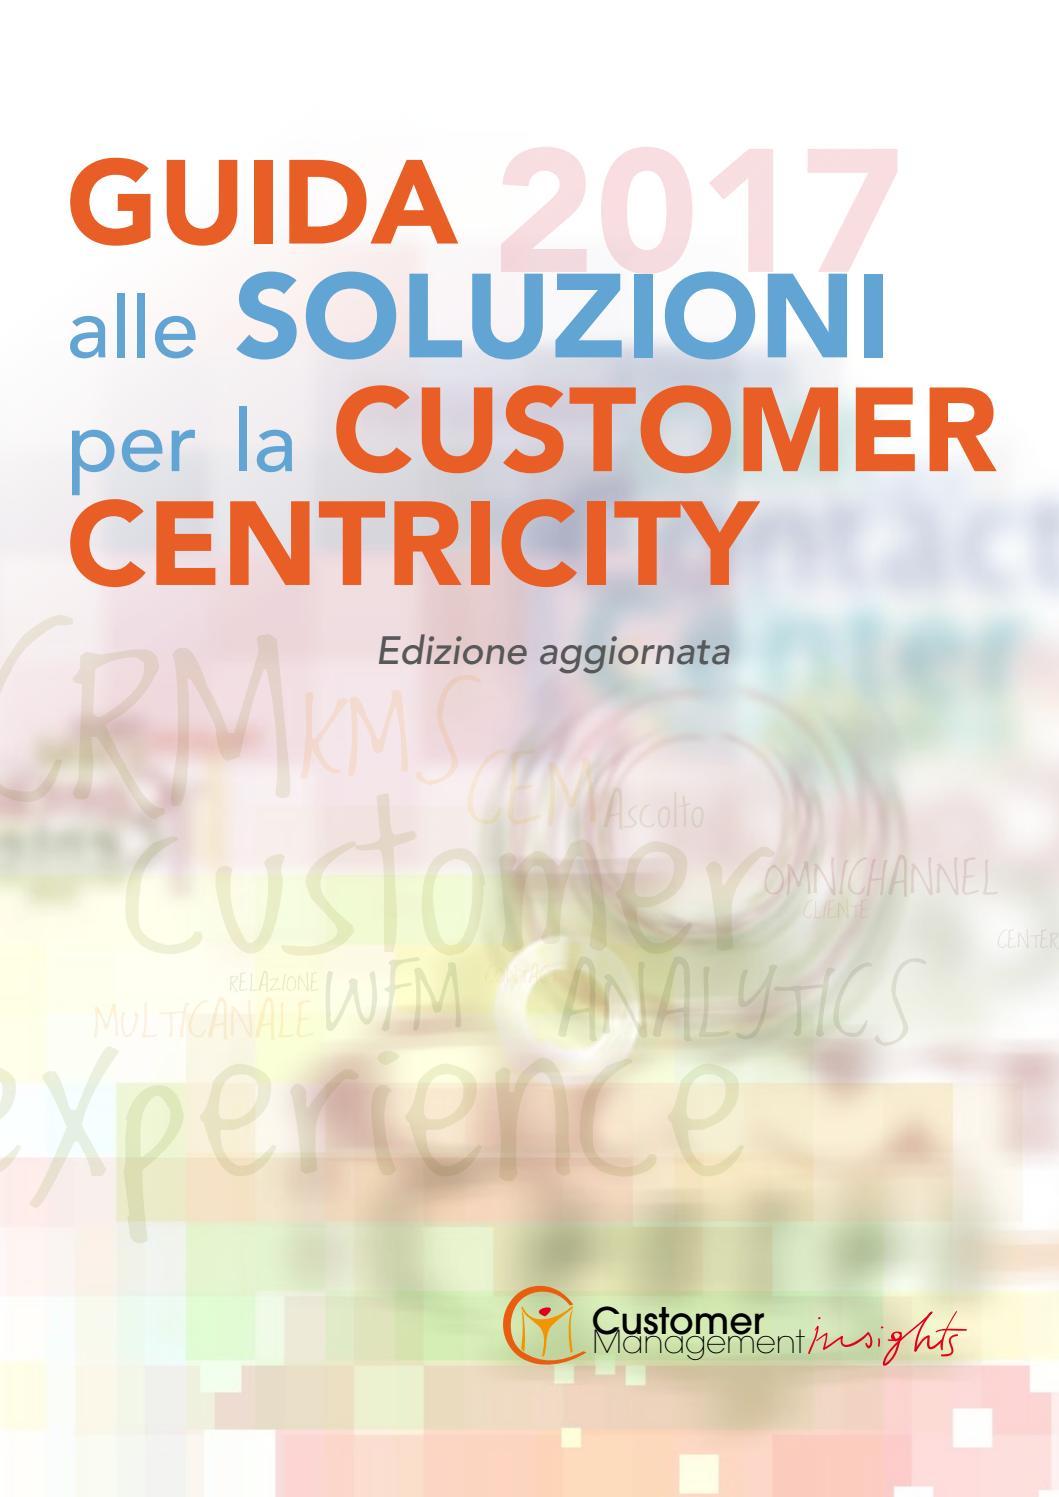 b2d62513f7 Guida alle soluzioni Customer Centric 2017 by L'Ippocastano srl - issuu